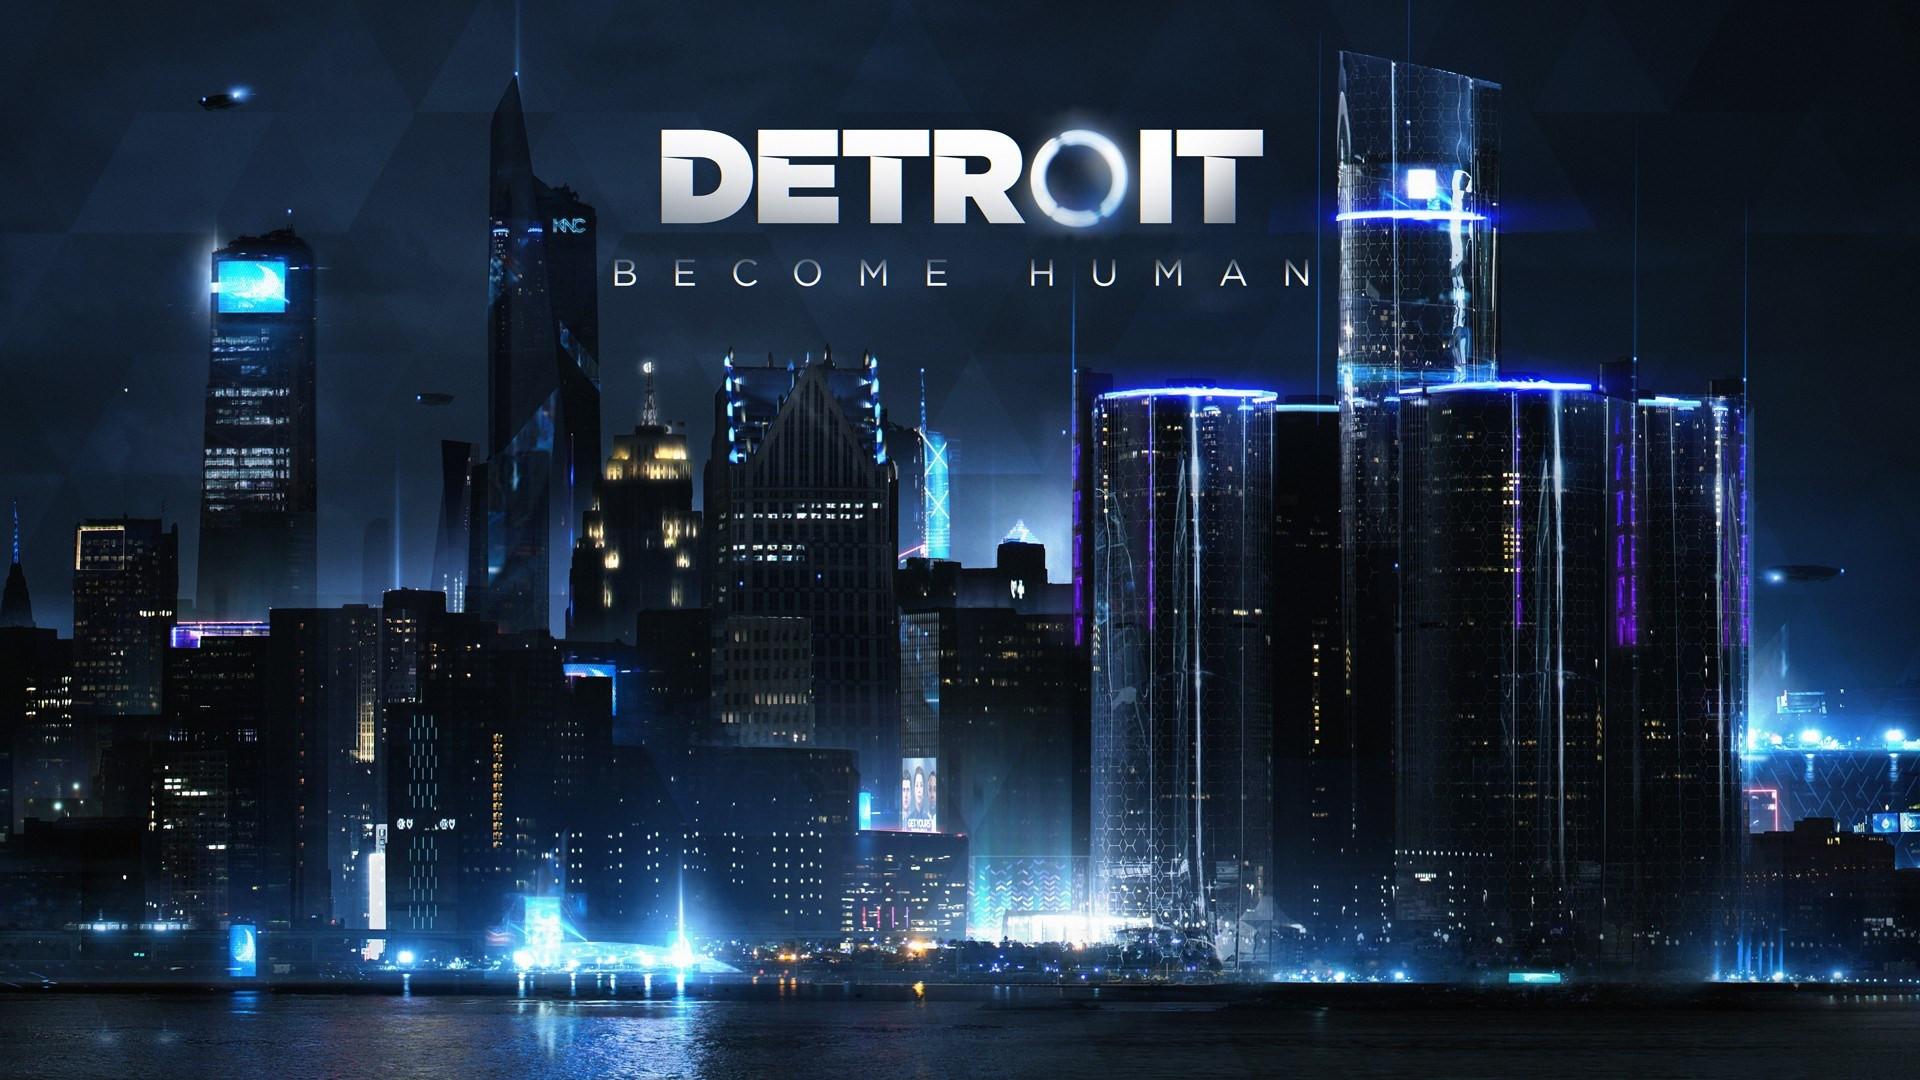 Download Wallpaper Detroit Become Human 1920x1080